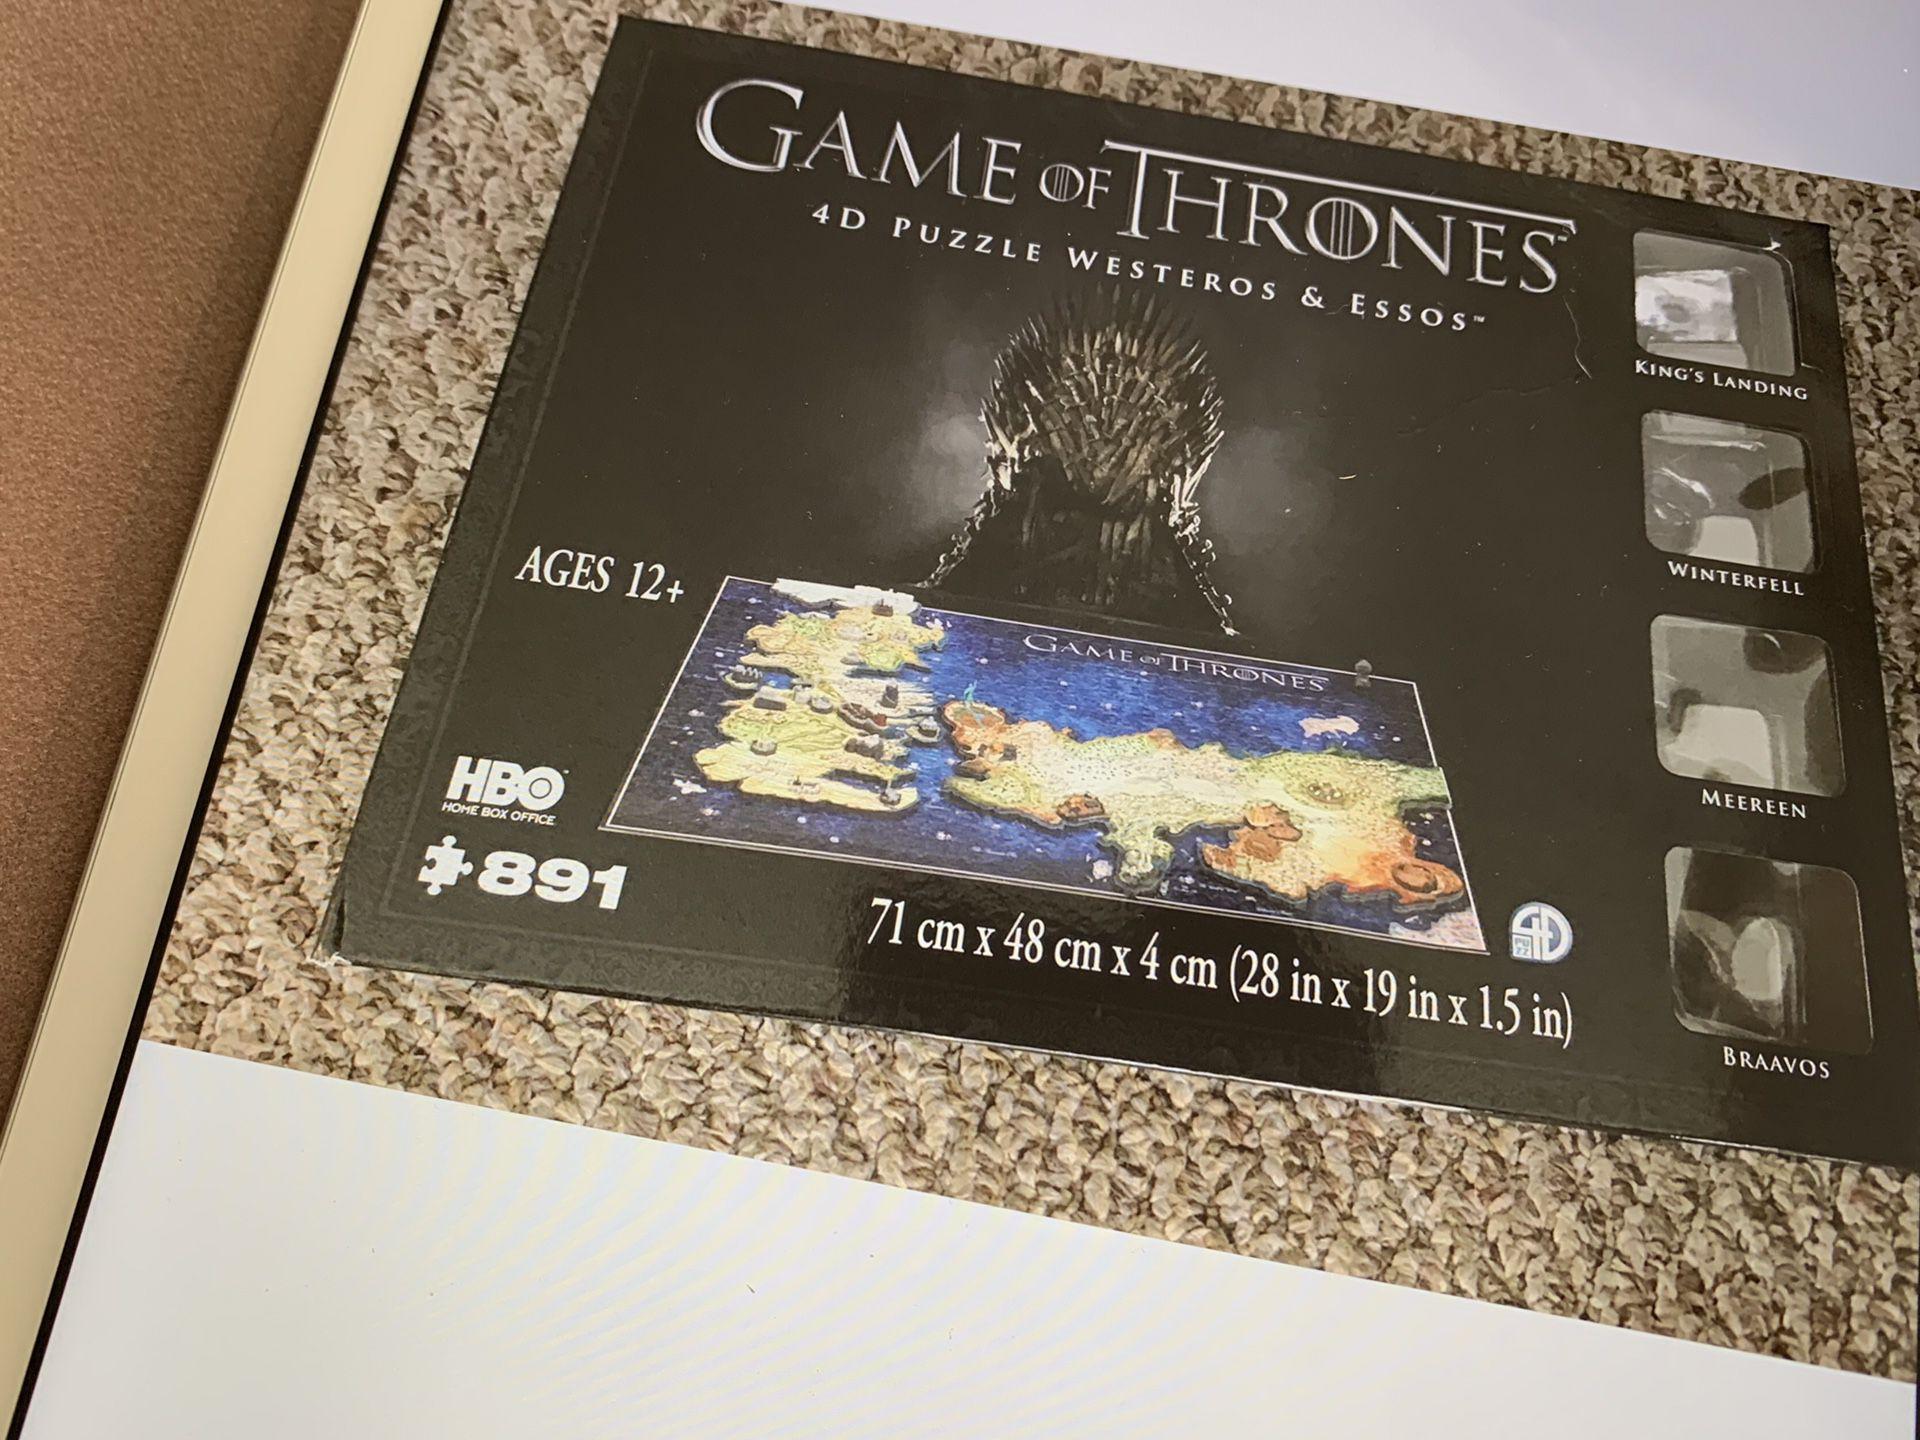 891 piece game of thrones 4D puzzle